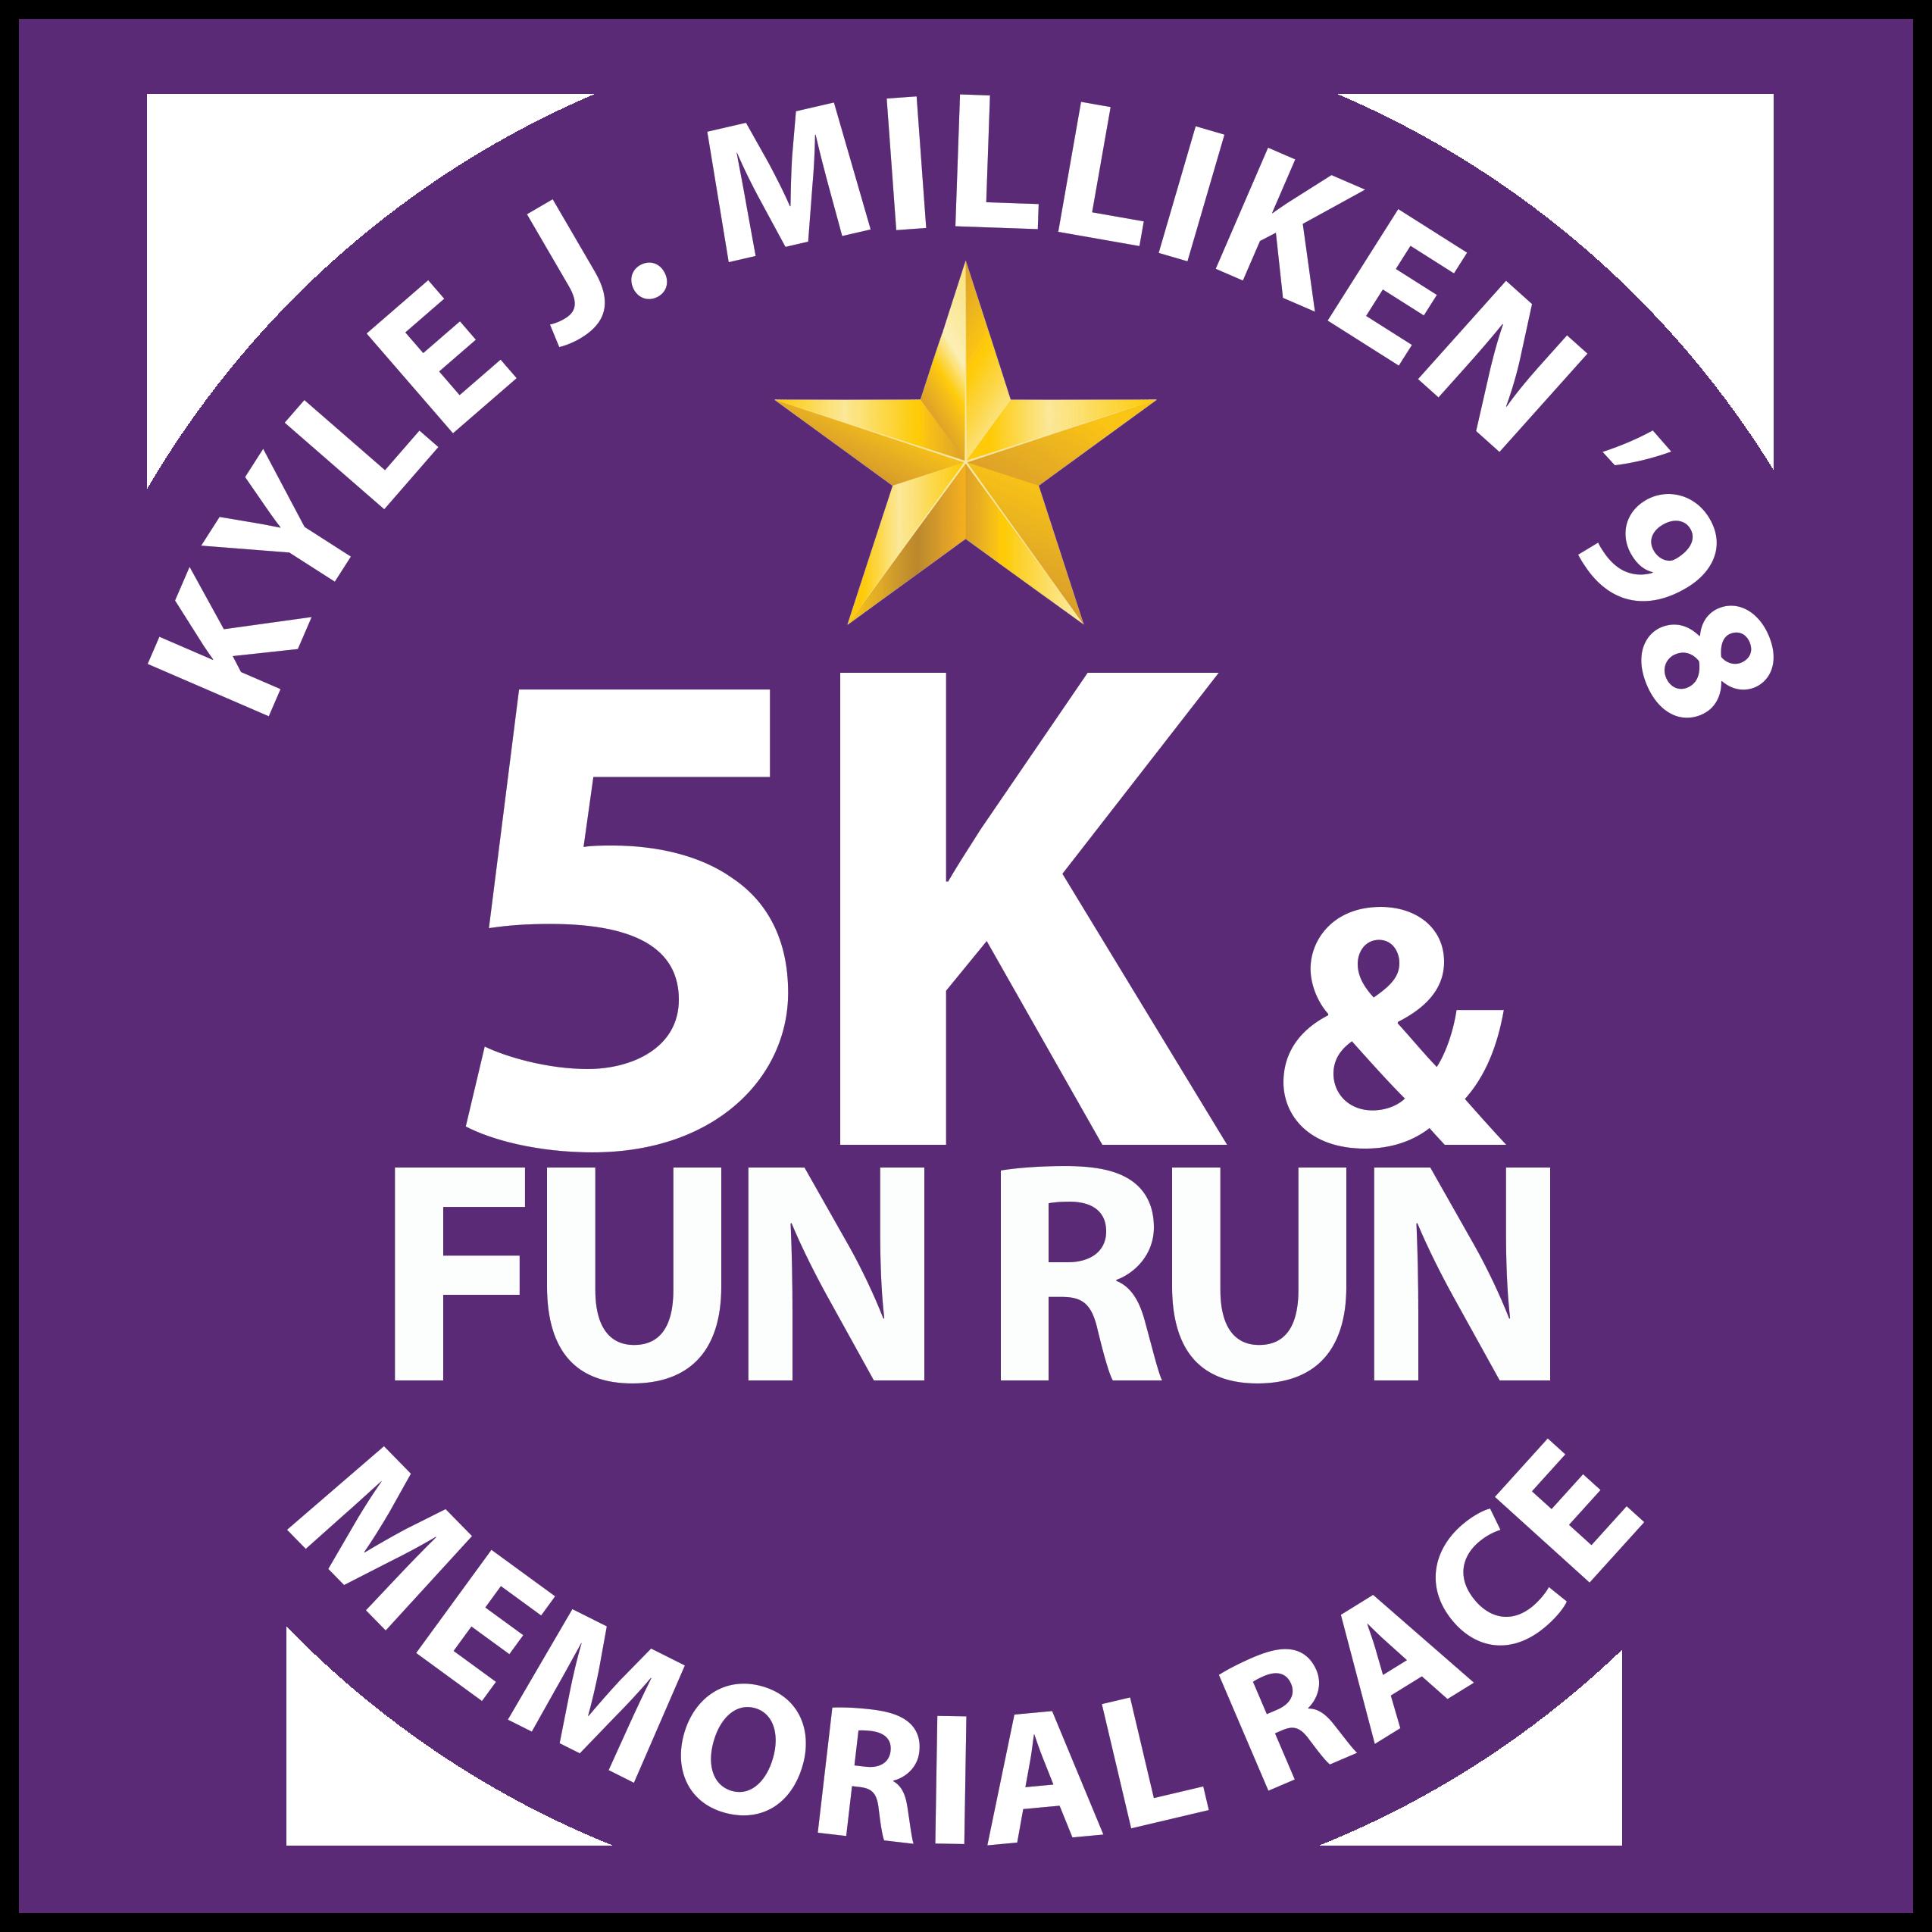 Kyle J Milliken 98 Memorial Scholarship Cheverus High School Relay Electric Virginia Beach